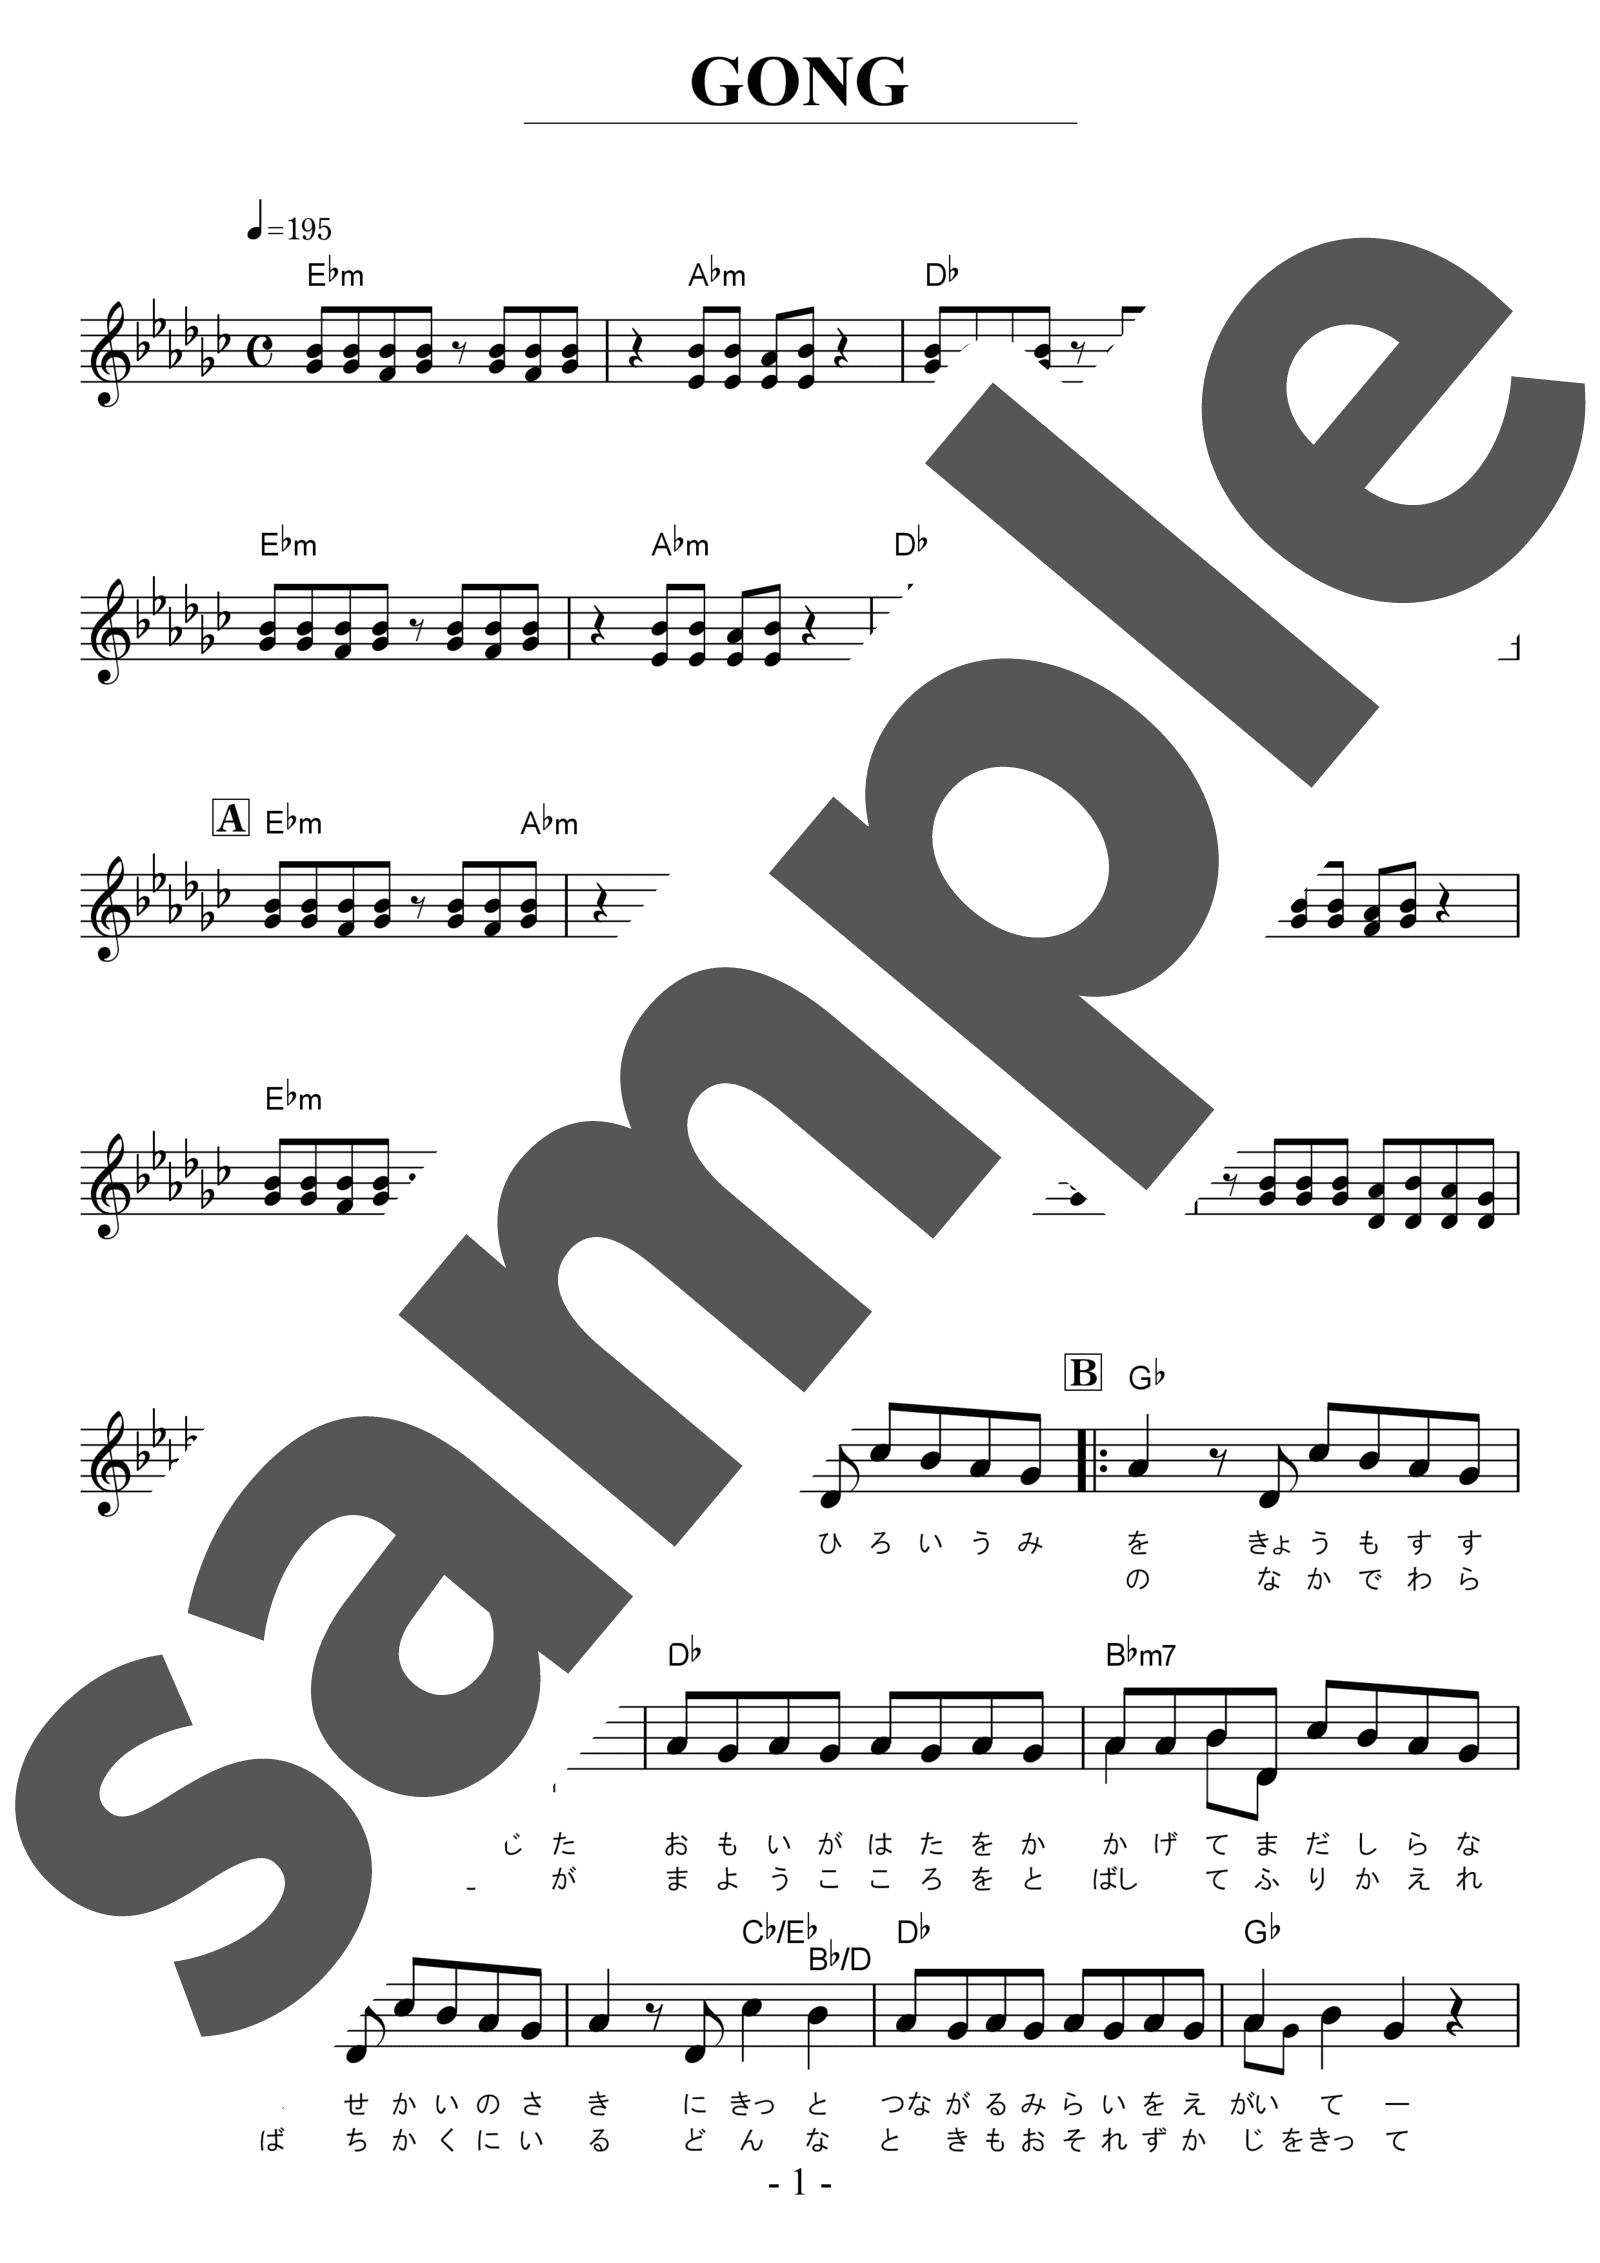 「GONG」のサンプル楽譜